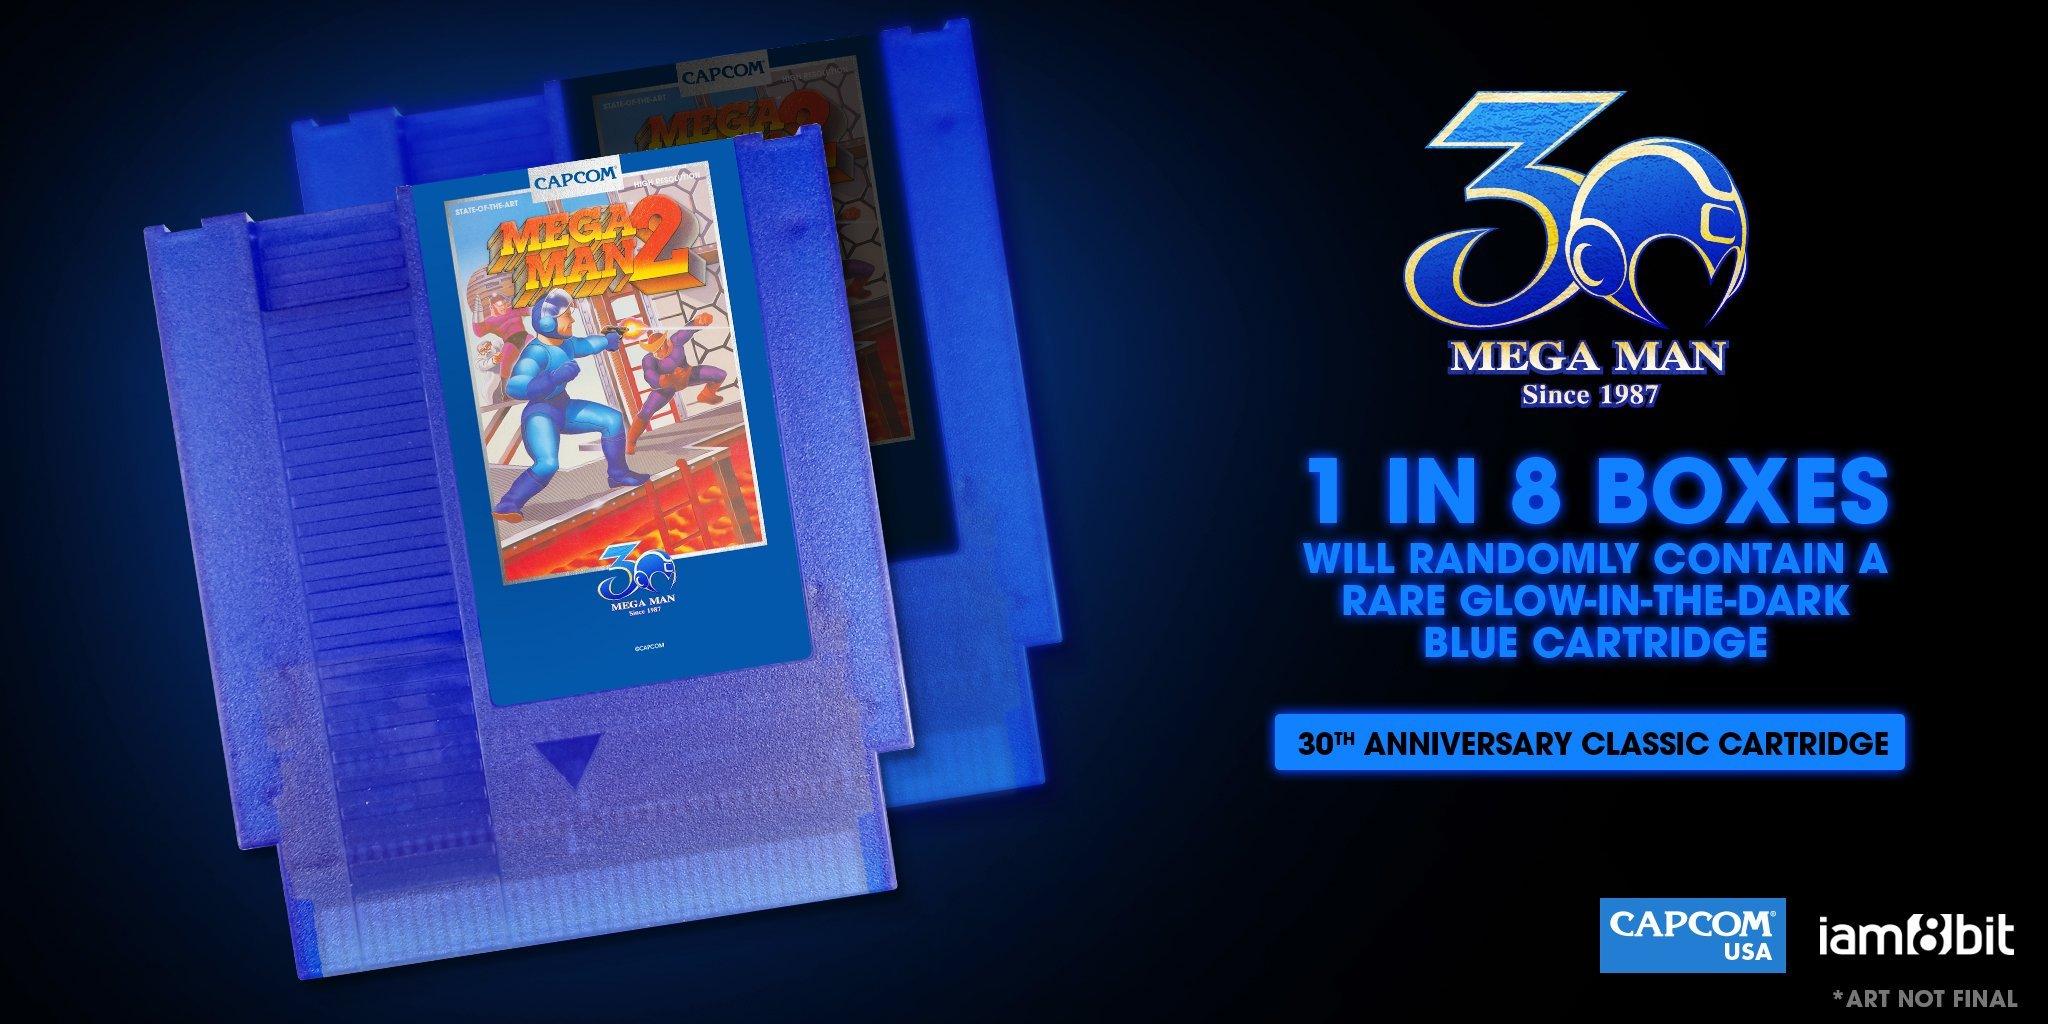 04-Mega Man 2-30th Anniversary Classic Cartridge